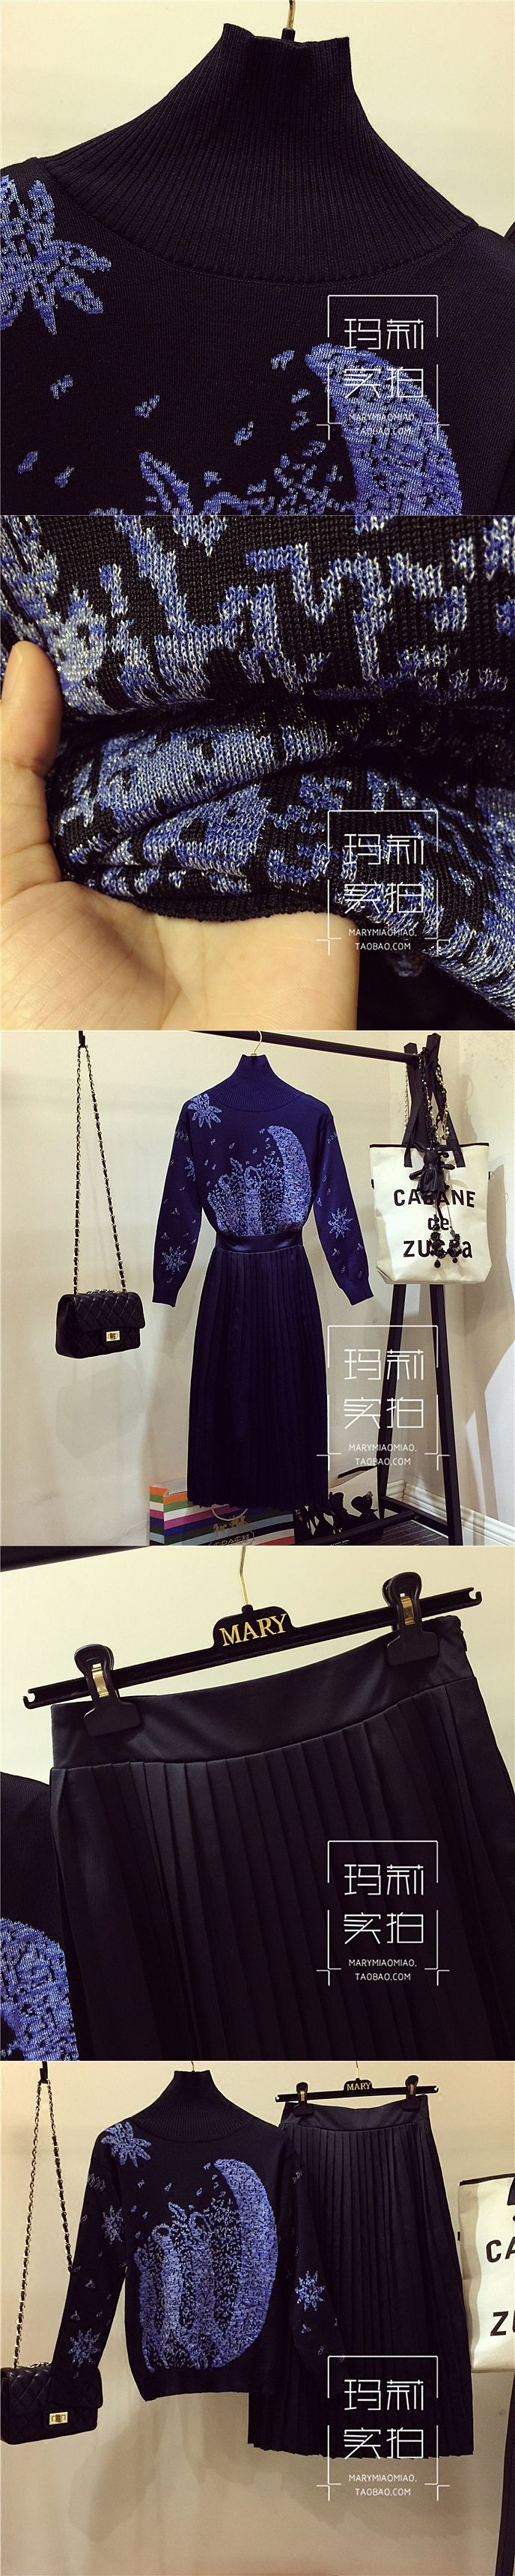 2017 Women Fashion Autumn Winter Clothing Set Lady Turtleneck Pullover Jacquard Stars Sweater + Slim Long Skirts Suit Vestidos